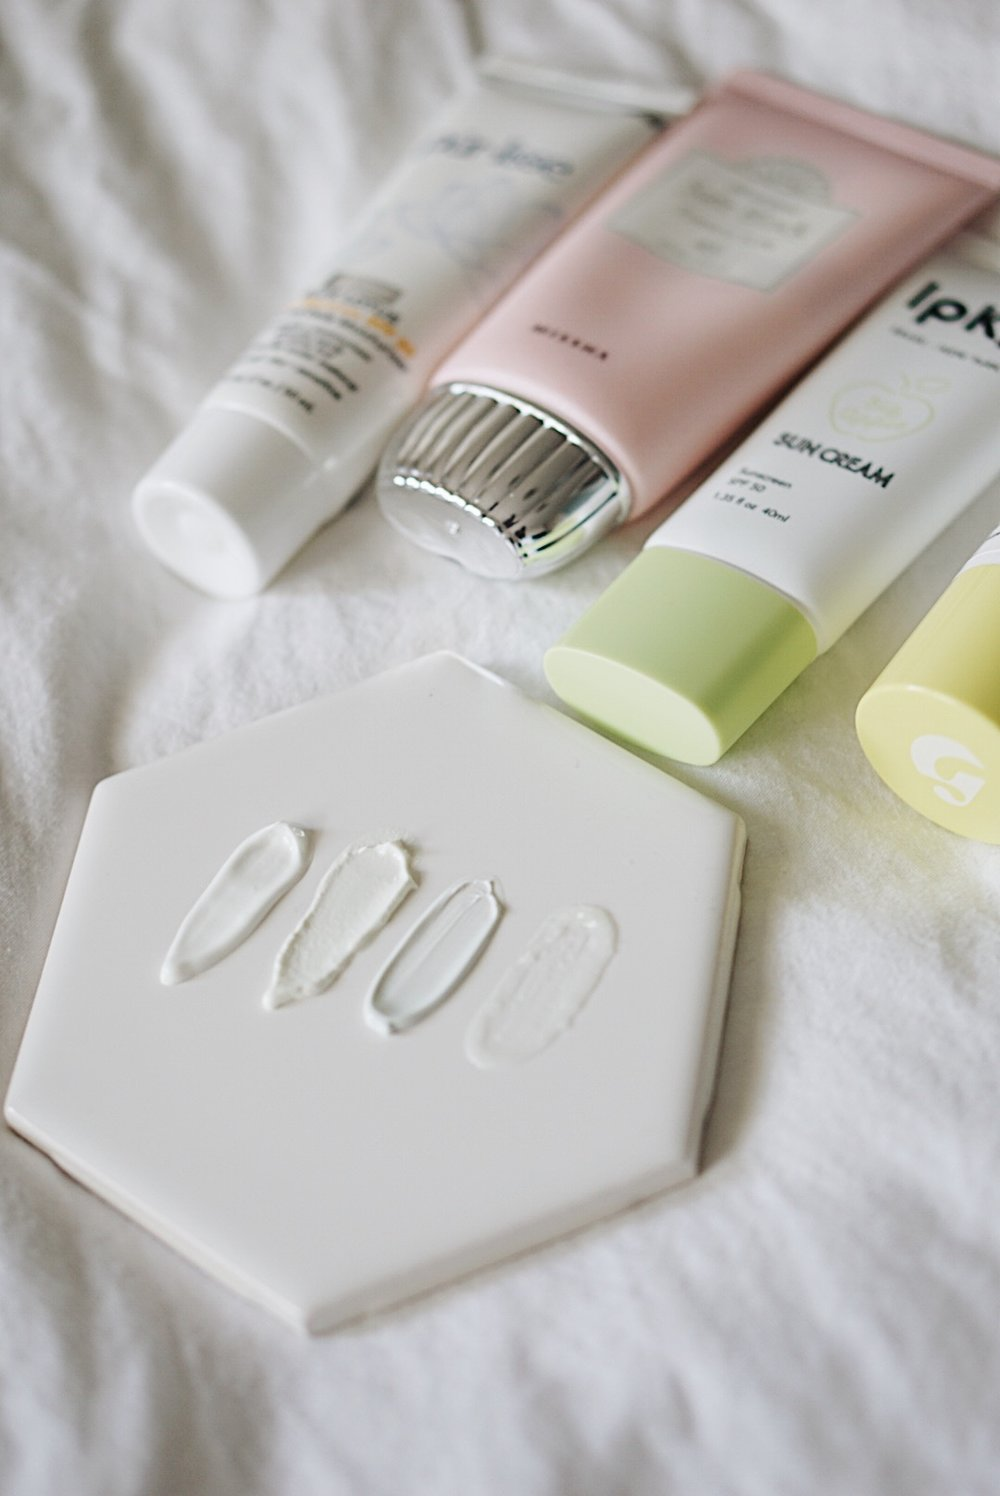 Sunscreen: Glossier, Purlisse, MISSHA, IPKN